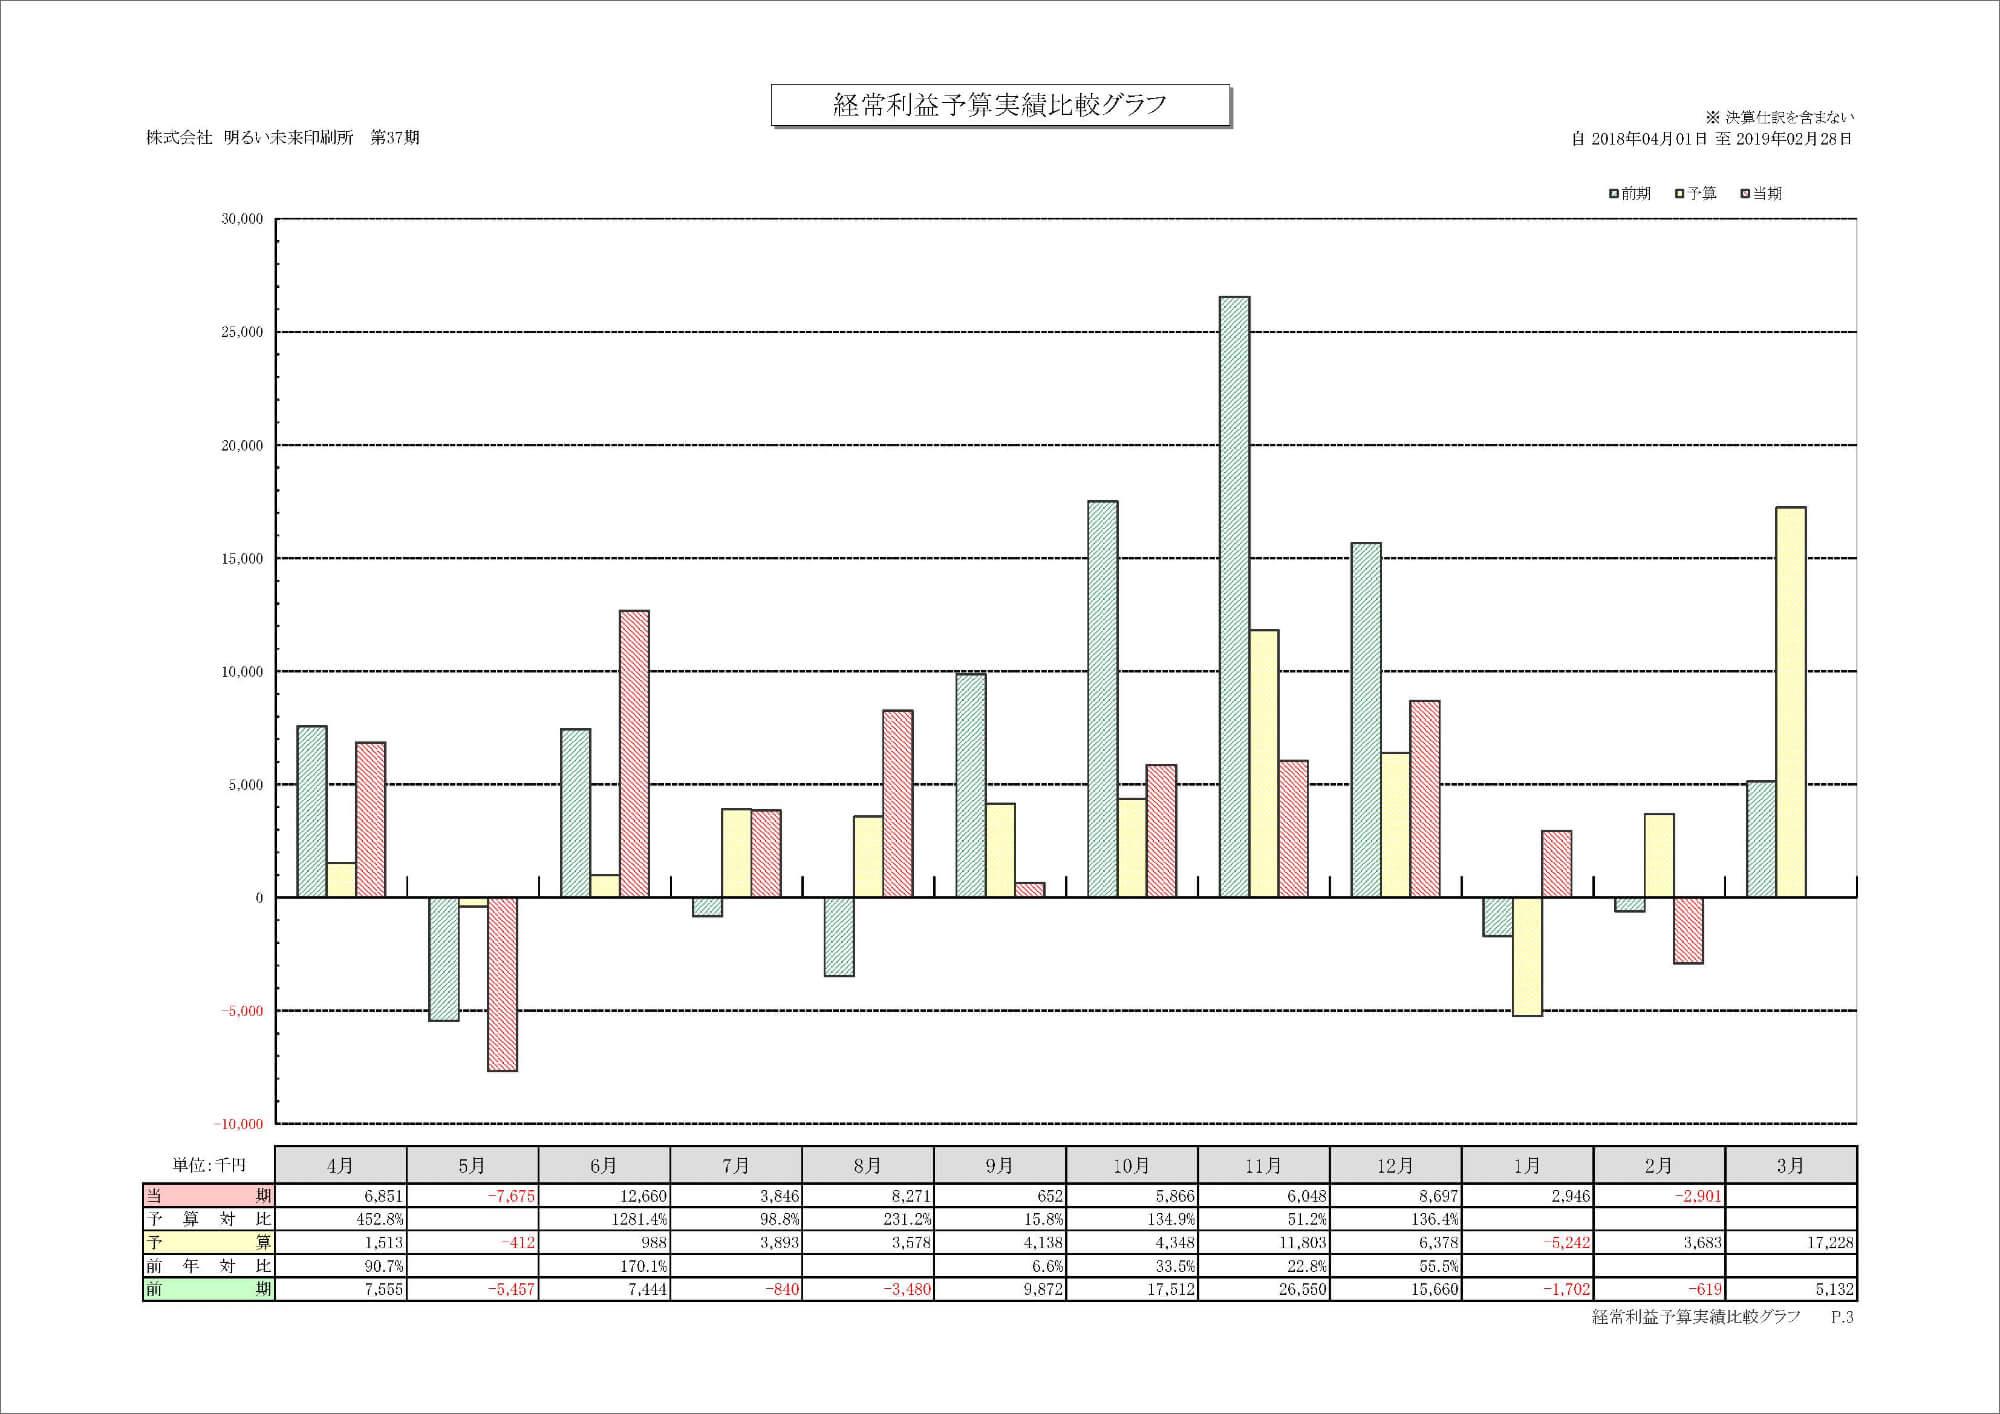 経常利益予算実績比較グラフ